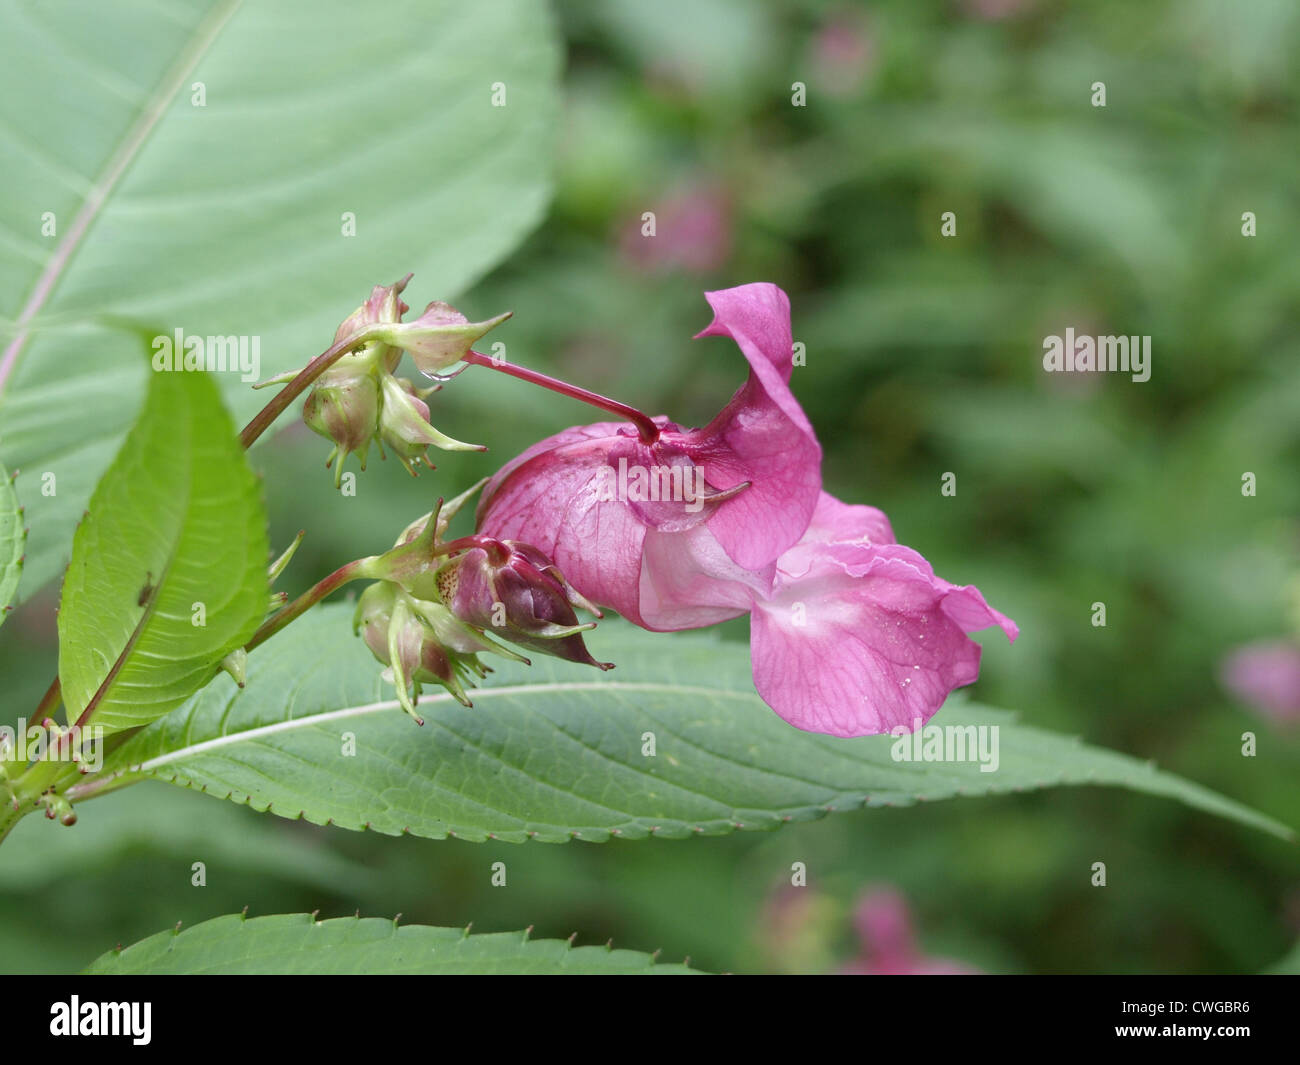 Himalayan Balsam / Policeman´s helmet / Impatiens glandulifera / Drüsiges Springkraut Stock Photo